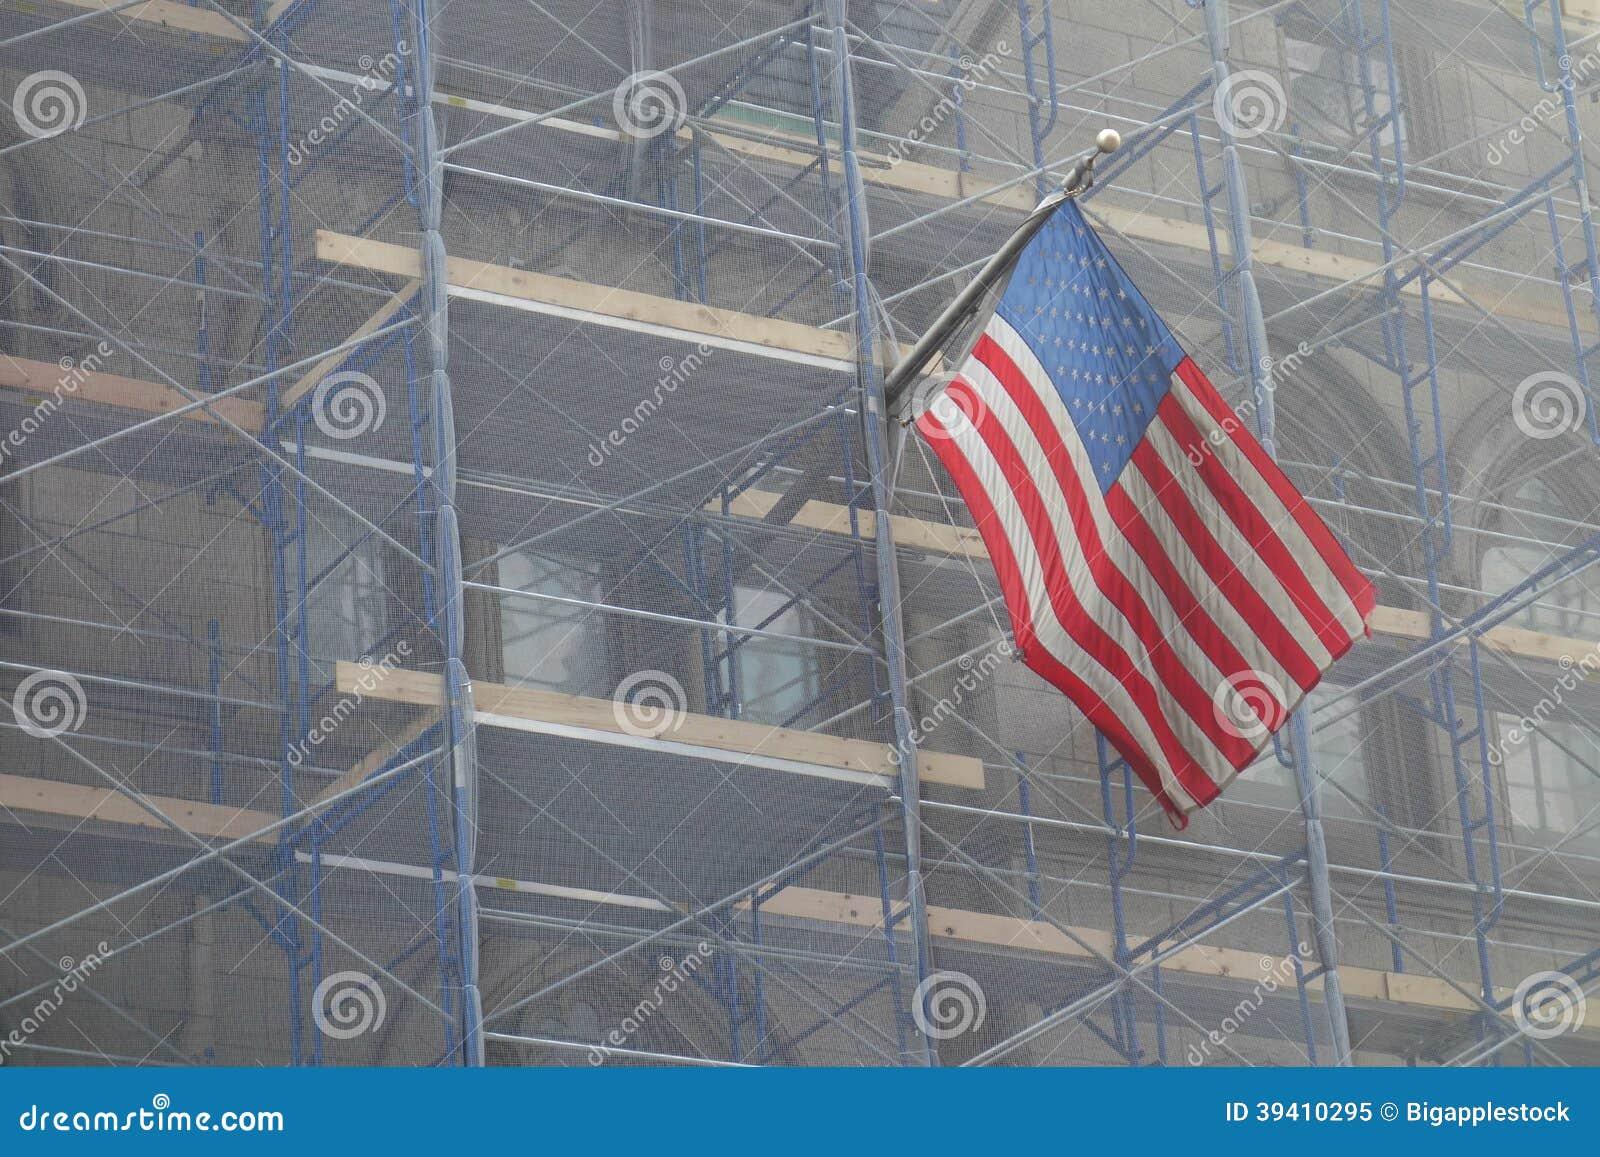 America Under Construction